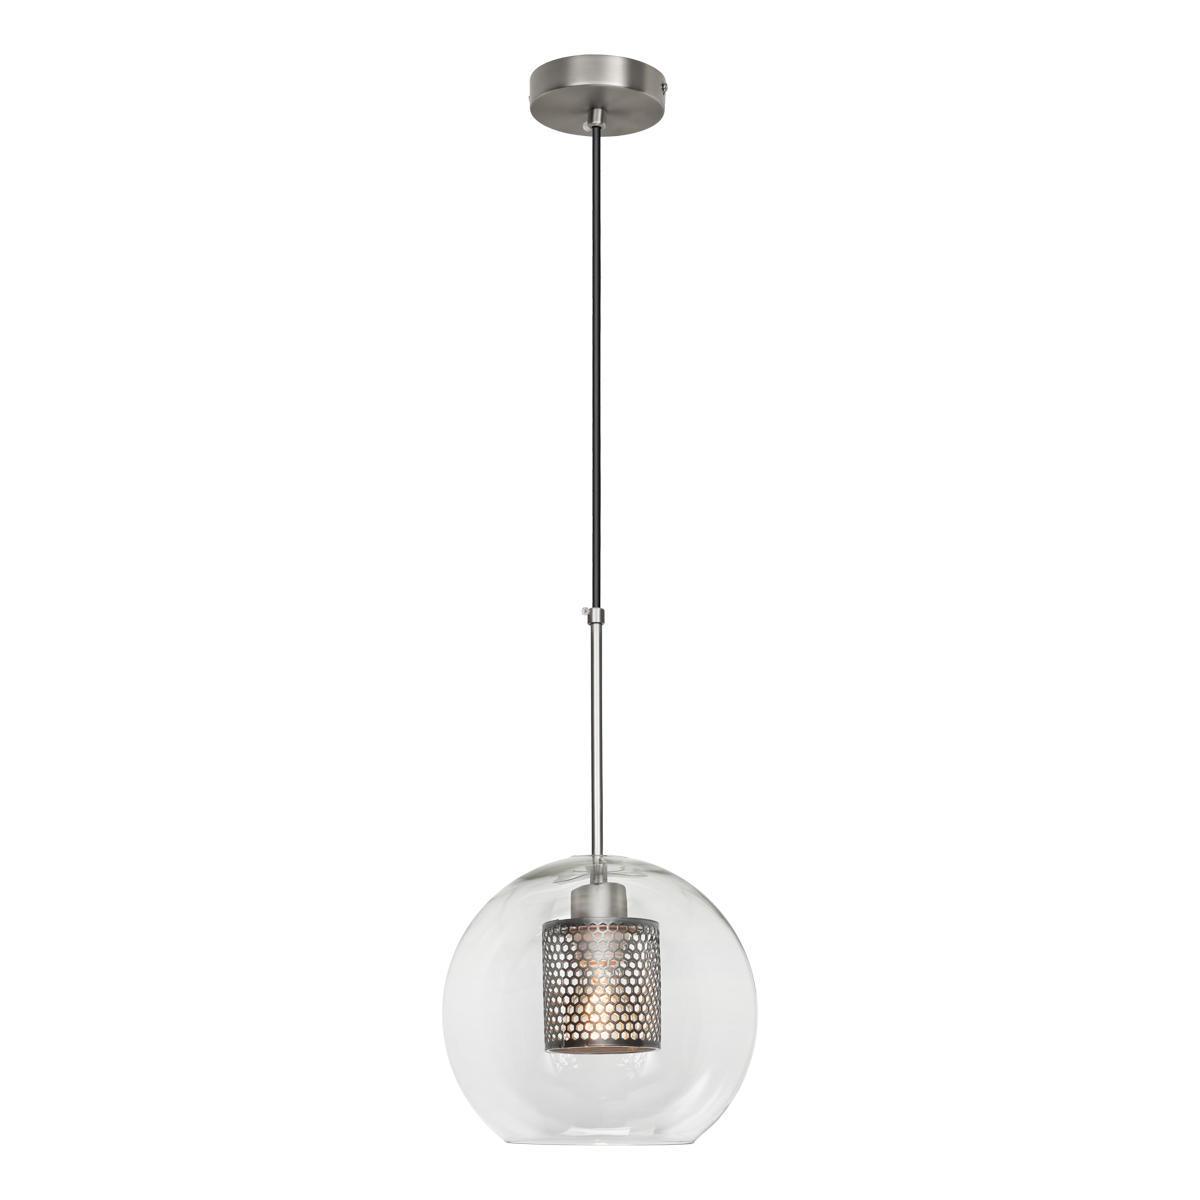 Подвесной светильник Loft It Hexagon LOFT2567-B, 1xE27x60W - фото 1